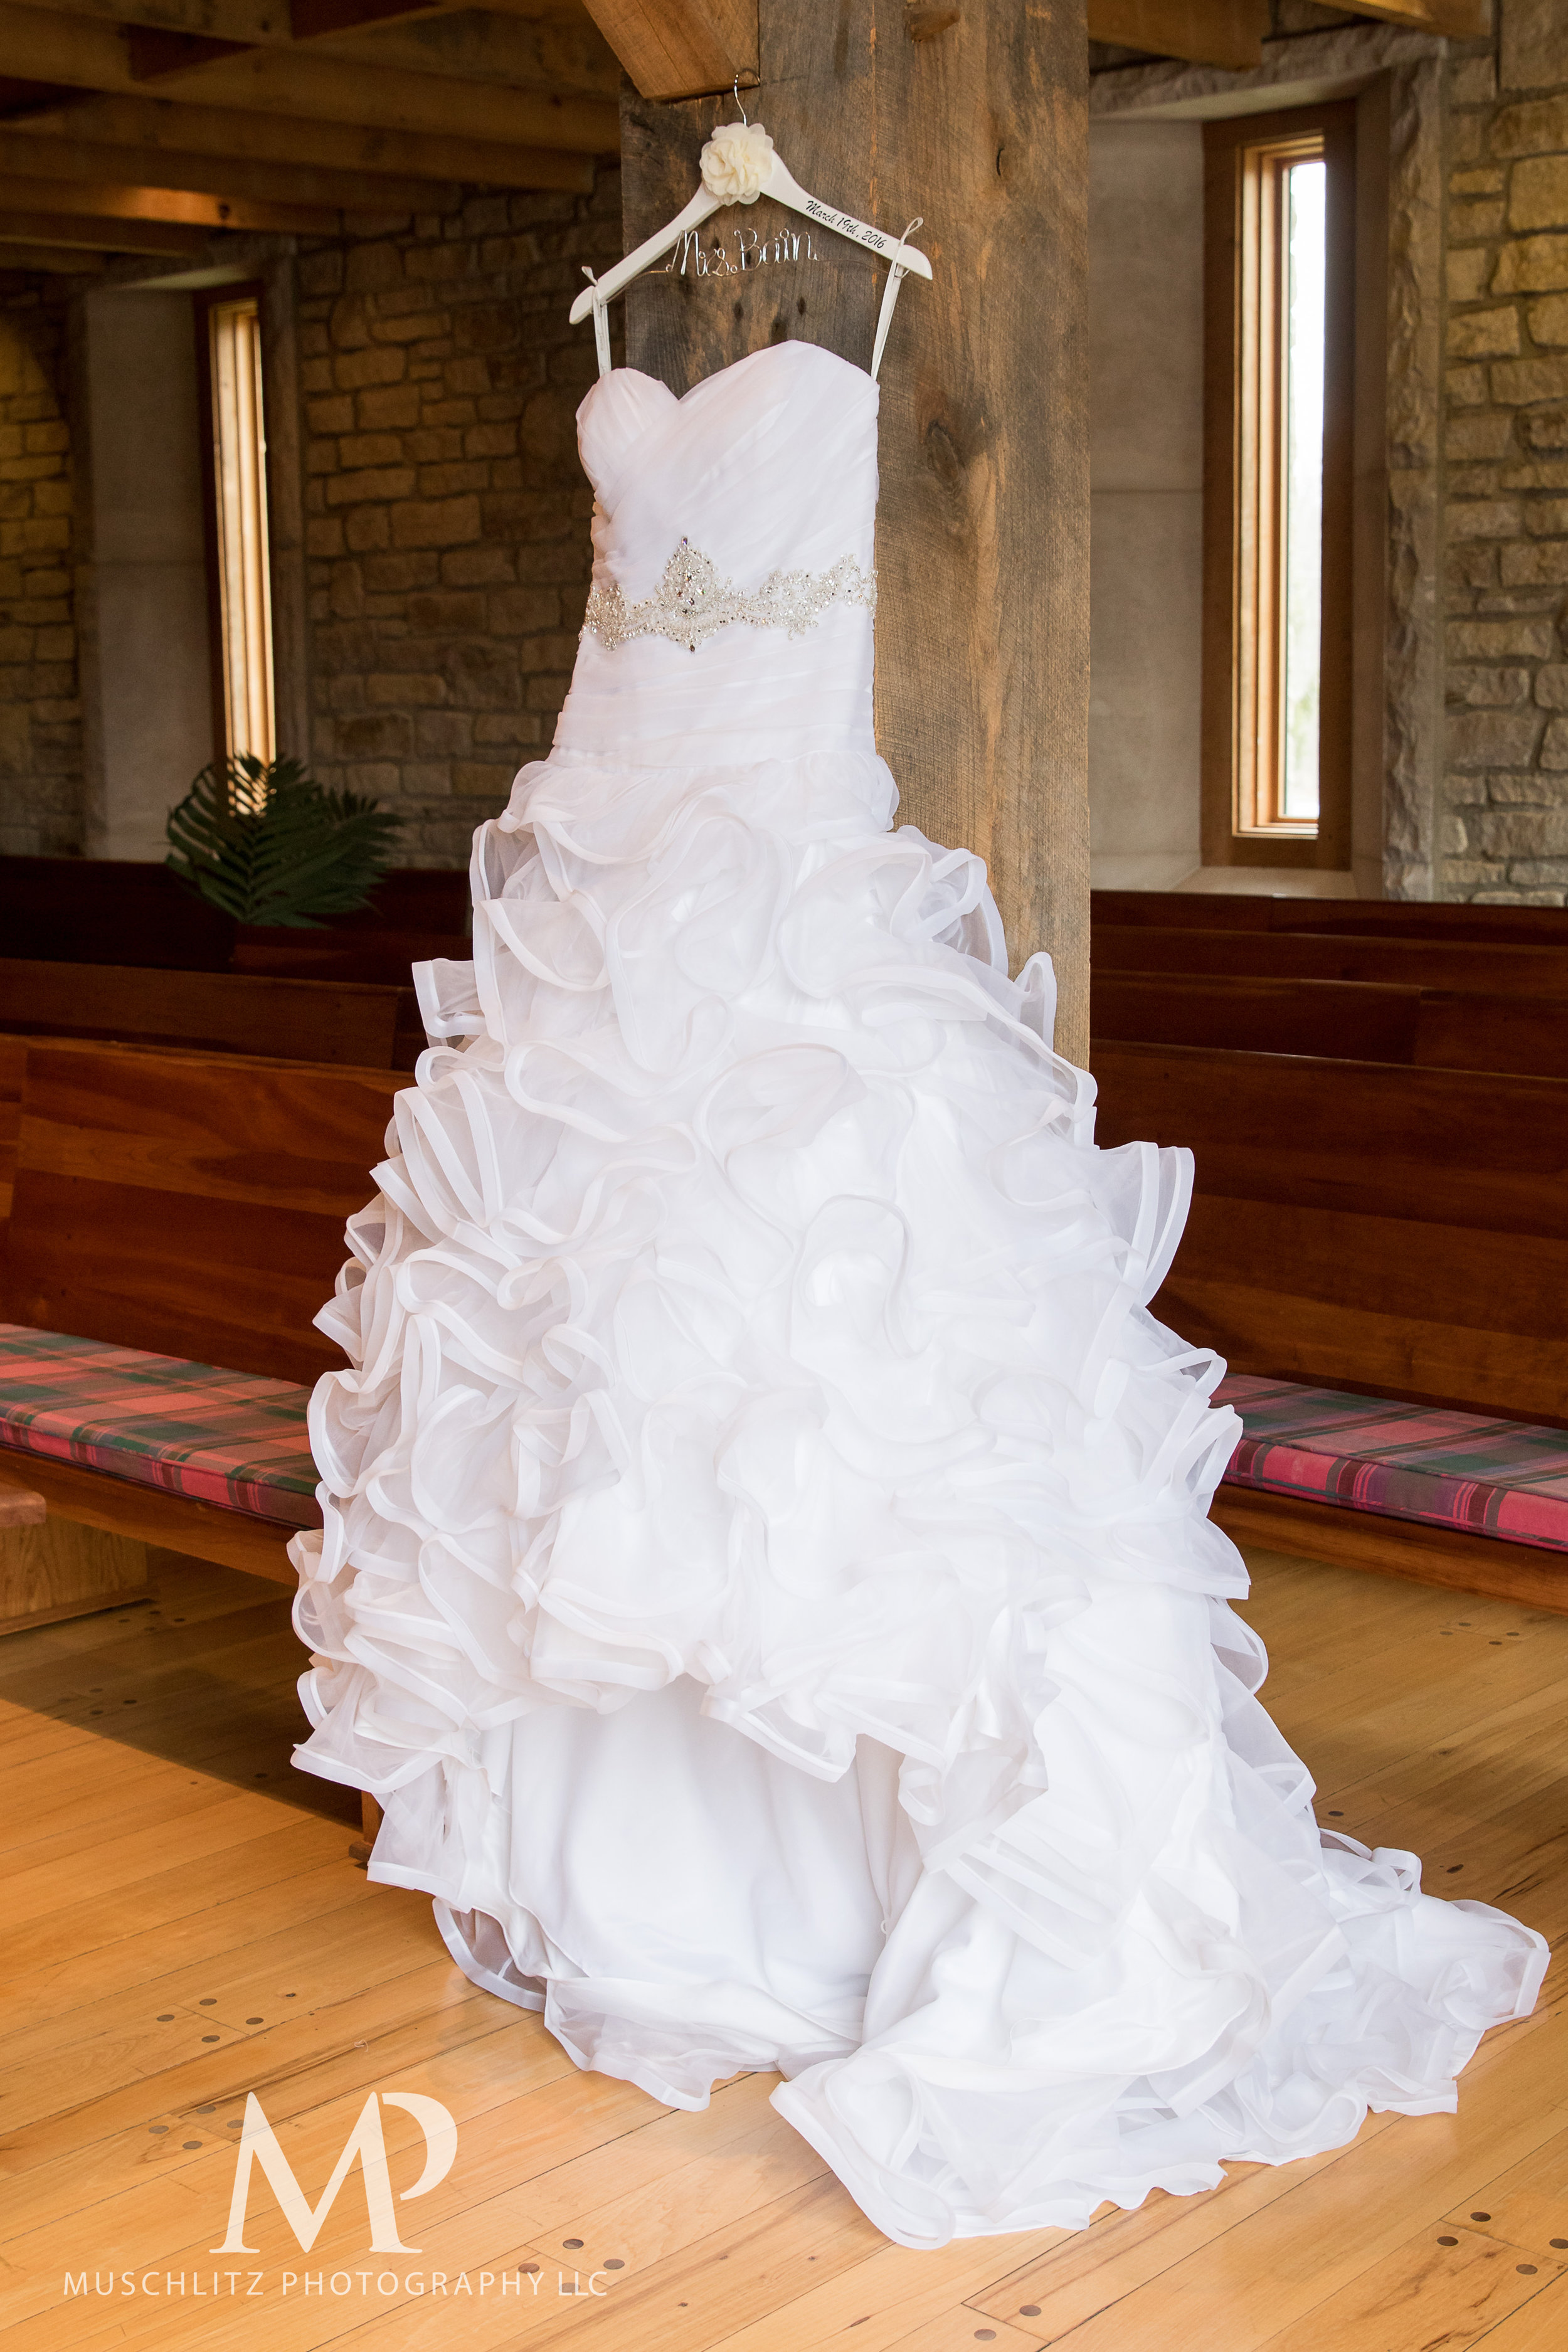 liberty-barn-presbyterian-church-wedding-delaware-columbus-ohio-muschlitz-photography-011.JPG